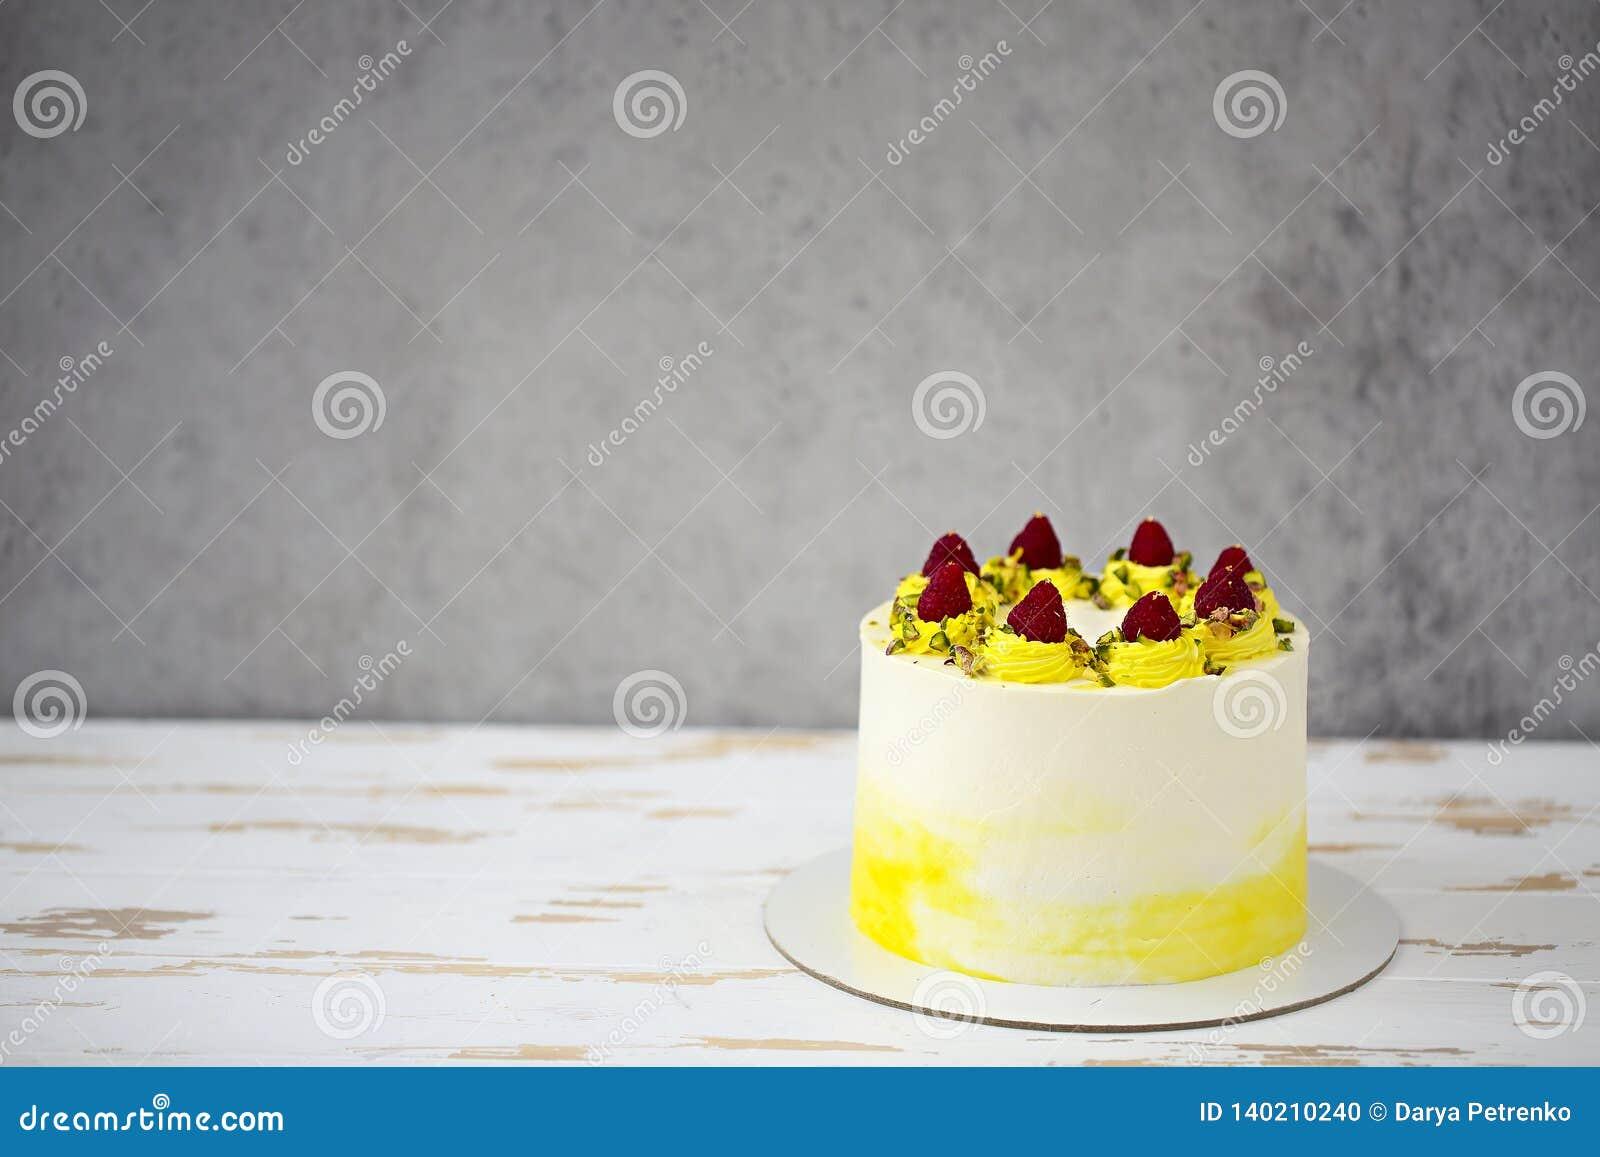 Beautiful happy birthday cake with mascarpone decorated with raspberry, pistachio